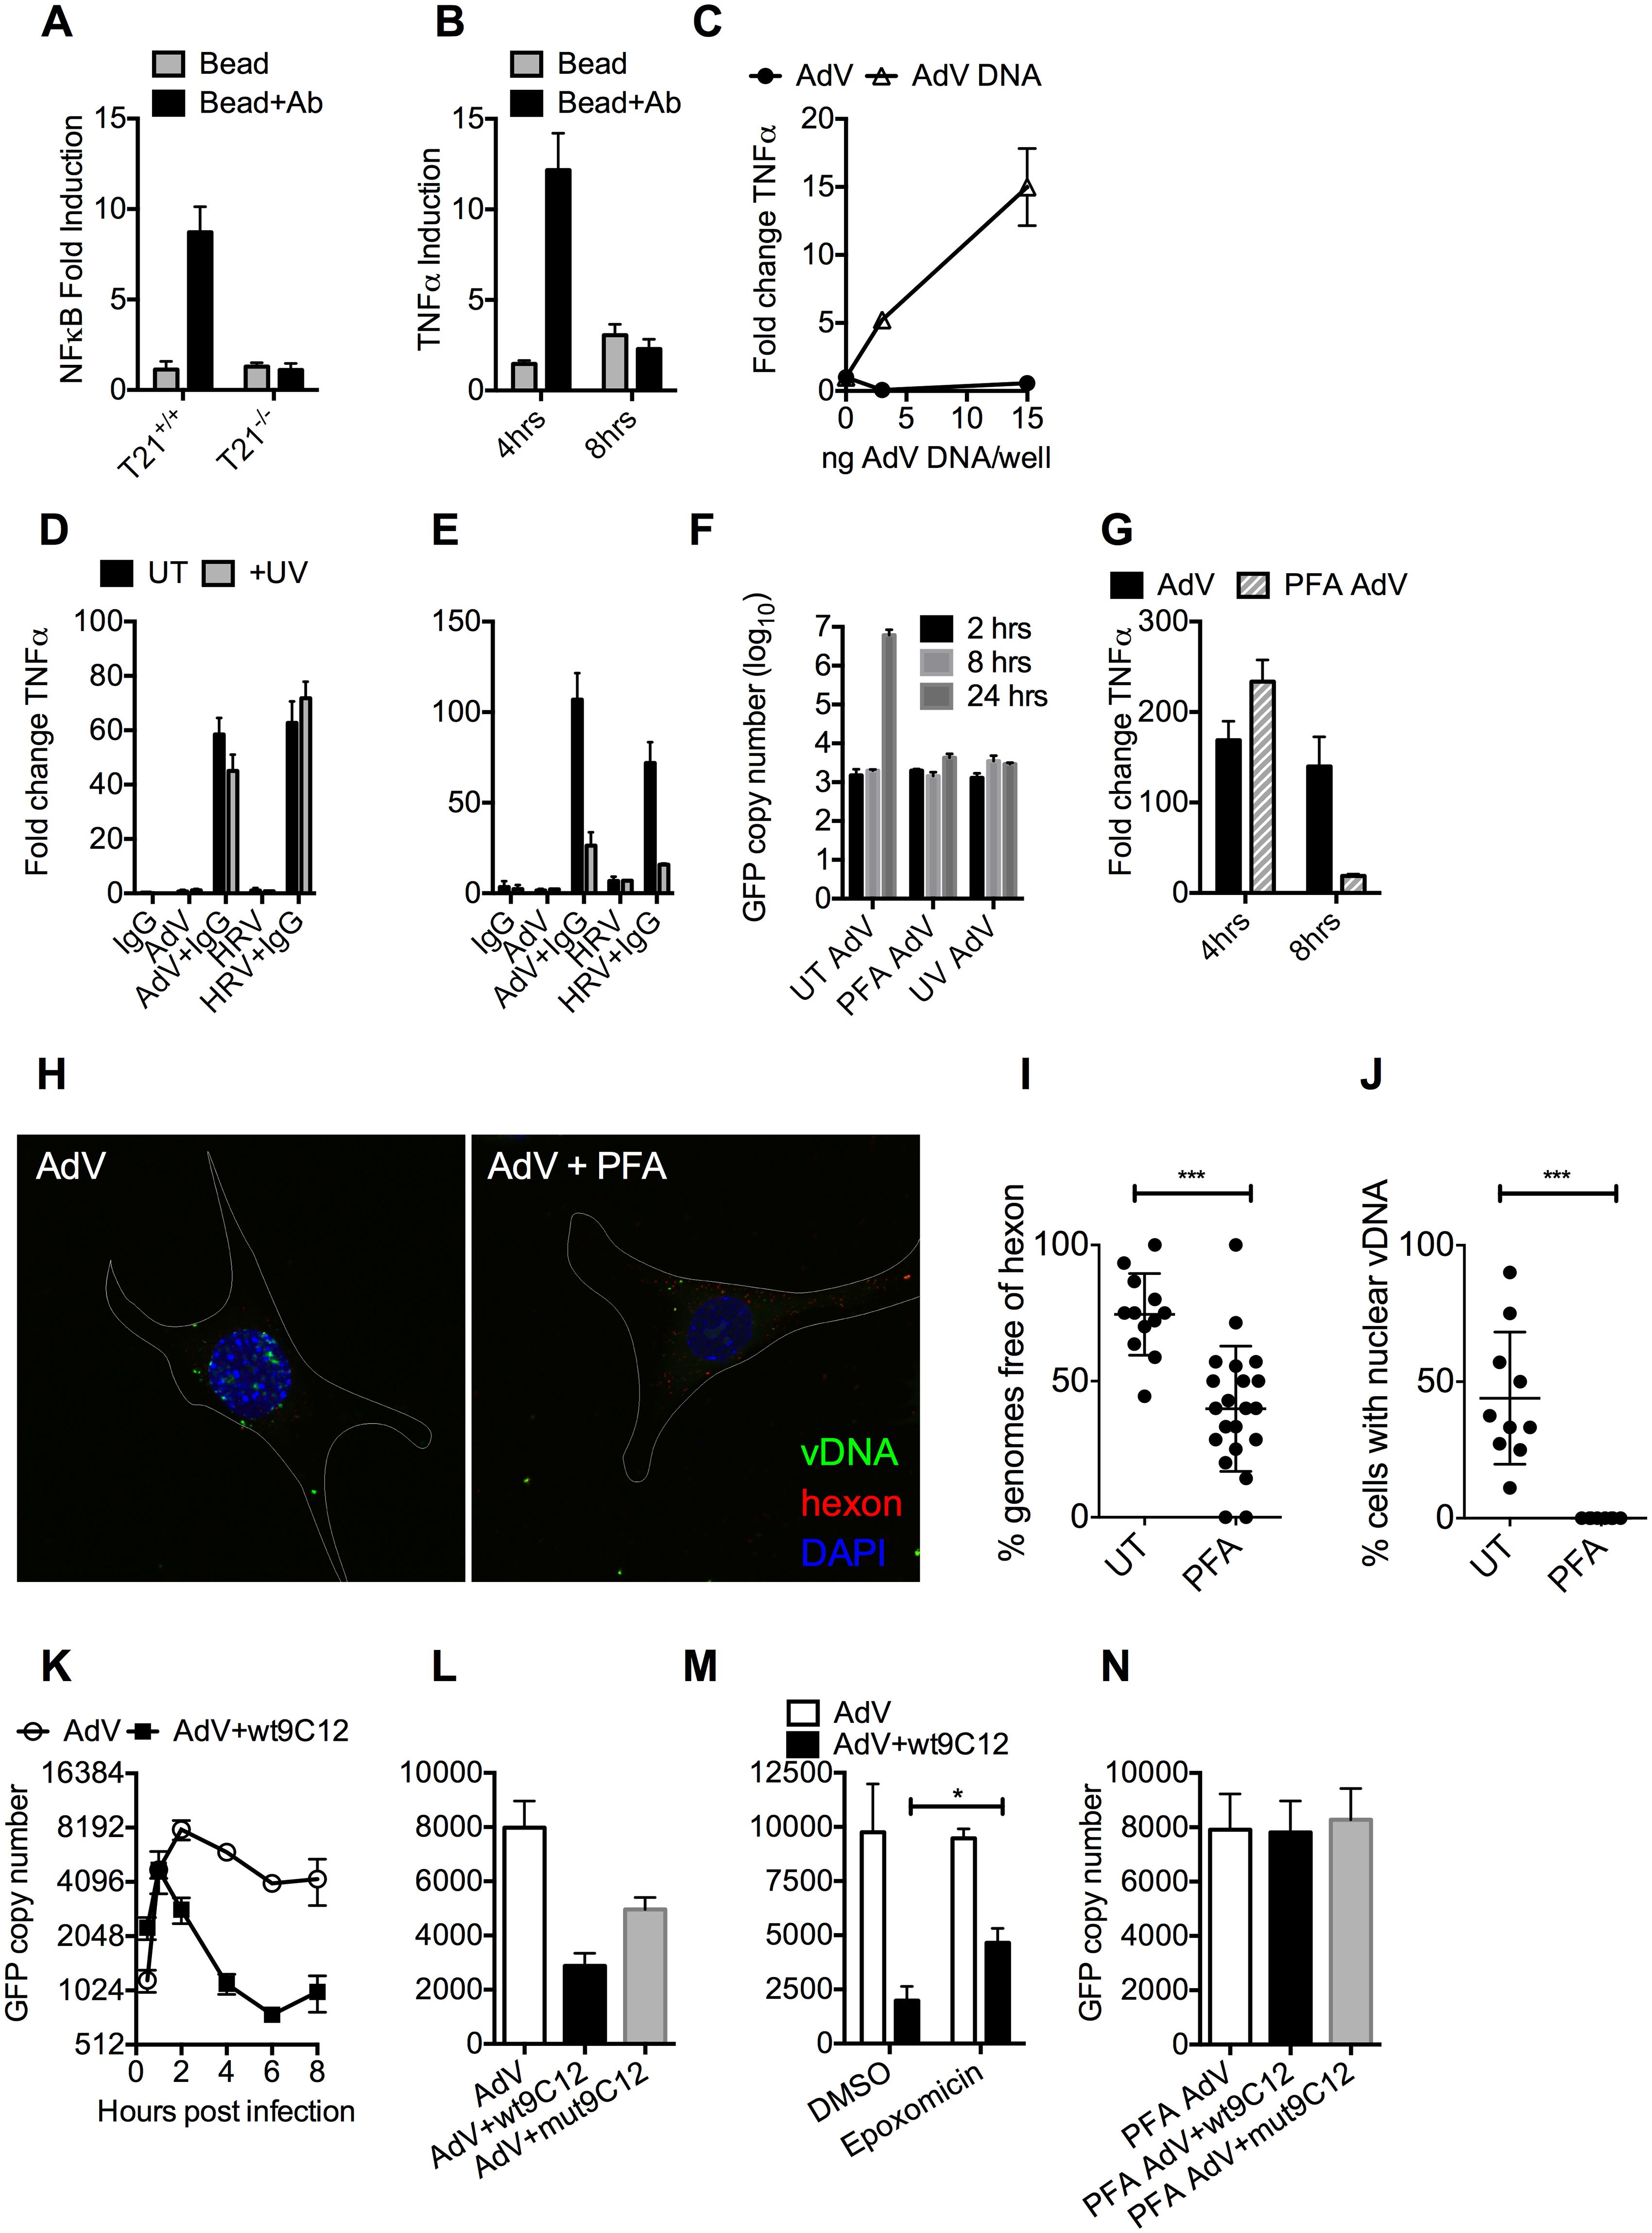 Antibody-dependent uncoating reveals viral genomes.